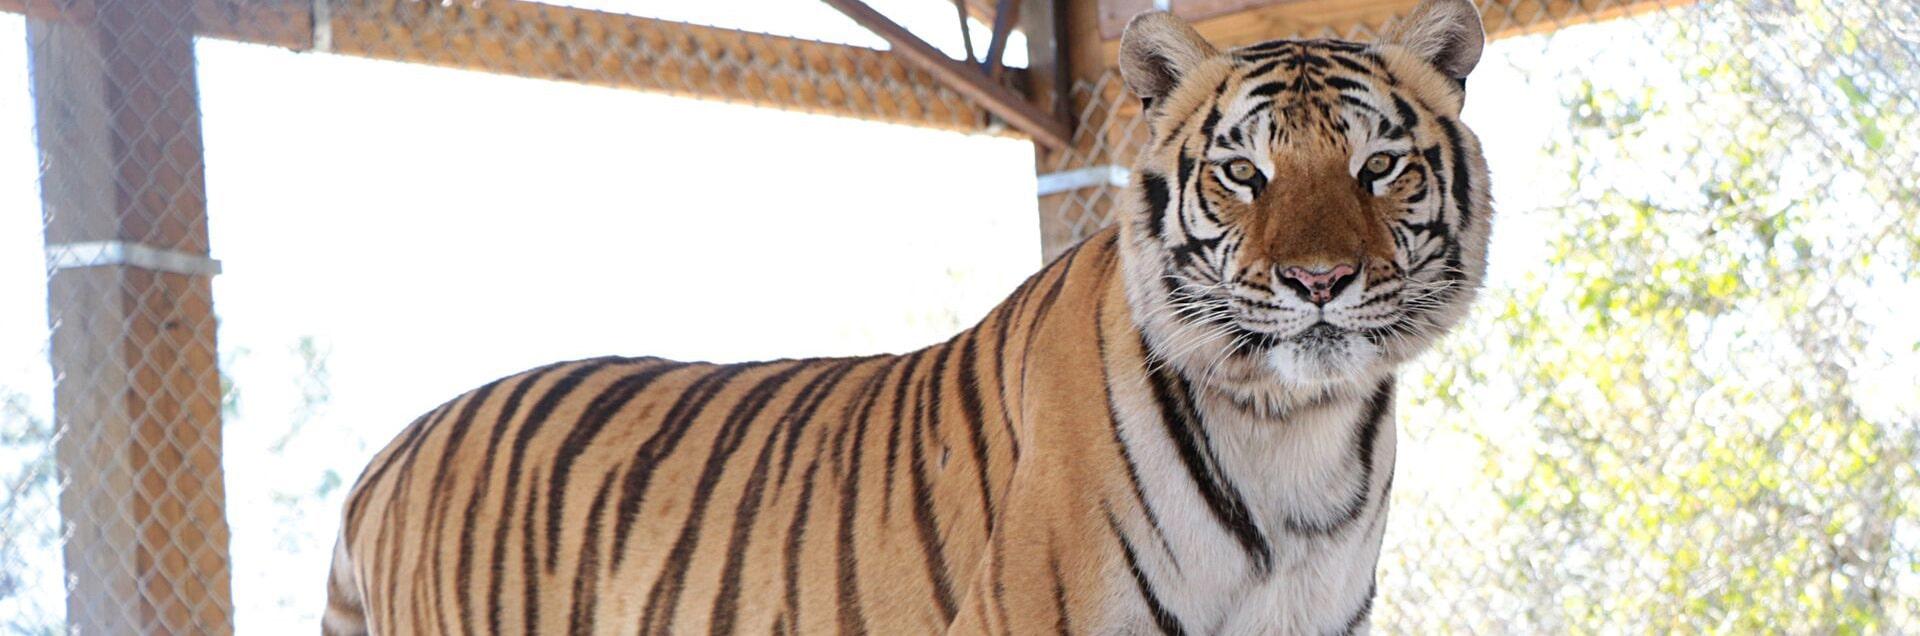 Agro - Central Florida Animal Reserve